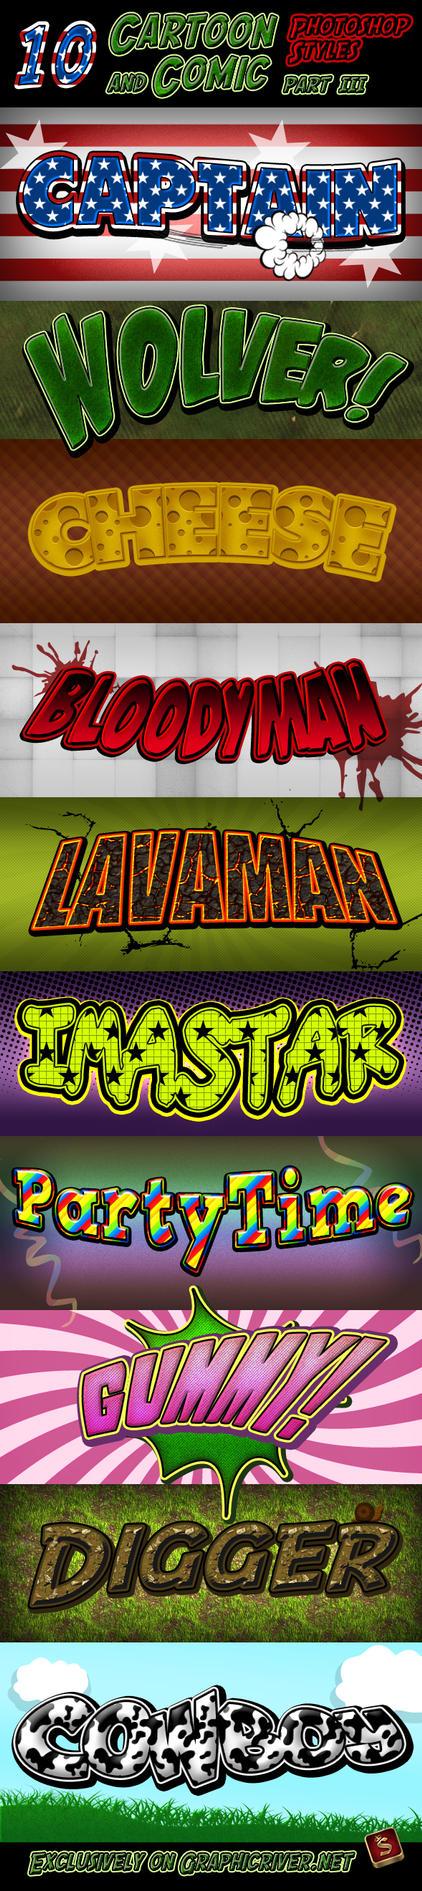 Cartoon + Comic Book Styles 3 by survivorcz